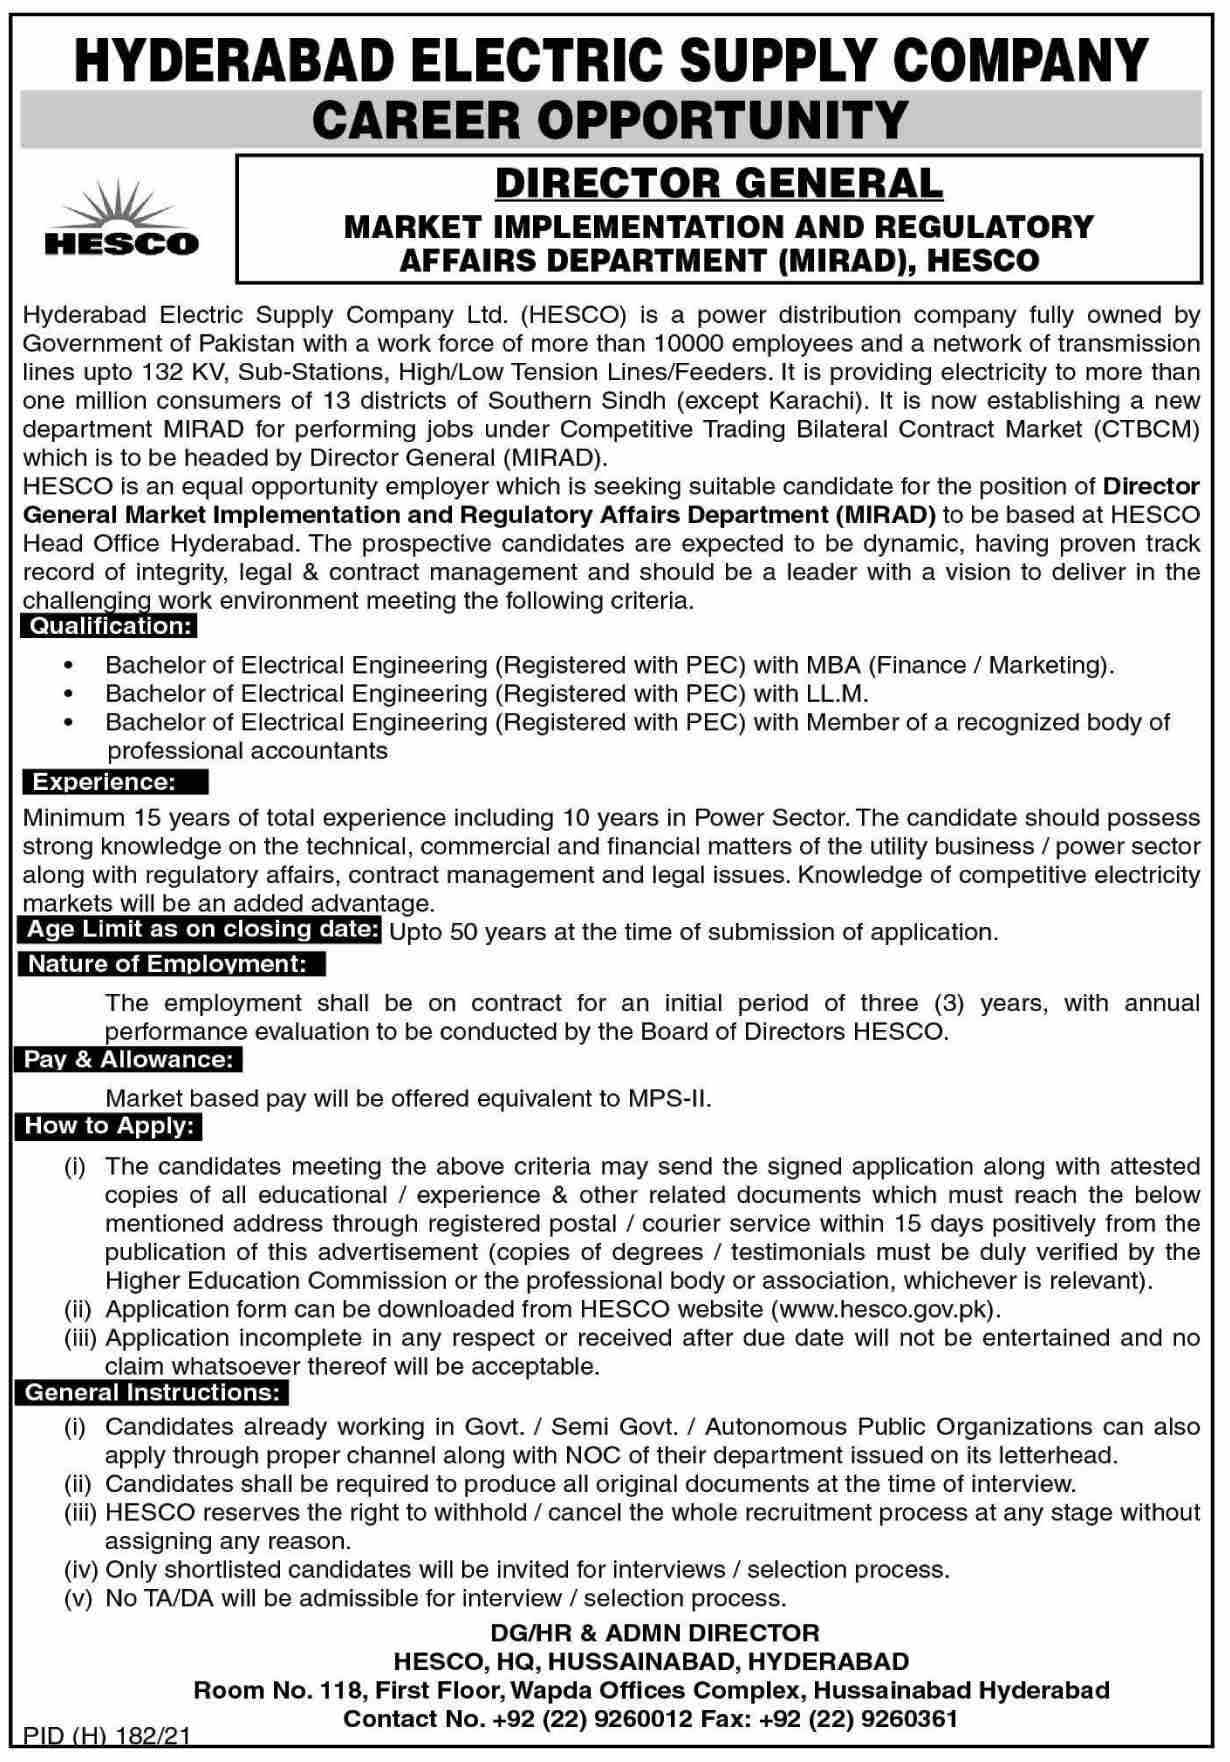 HESCO Jobs 2021 Hyderabad Electric Supply Company